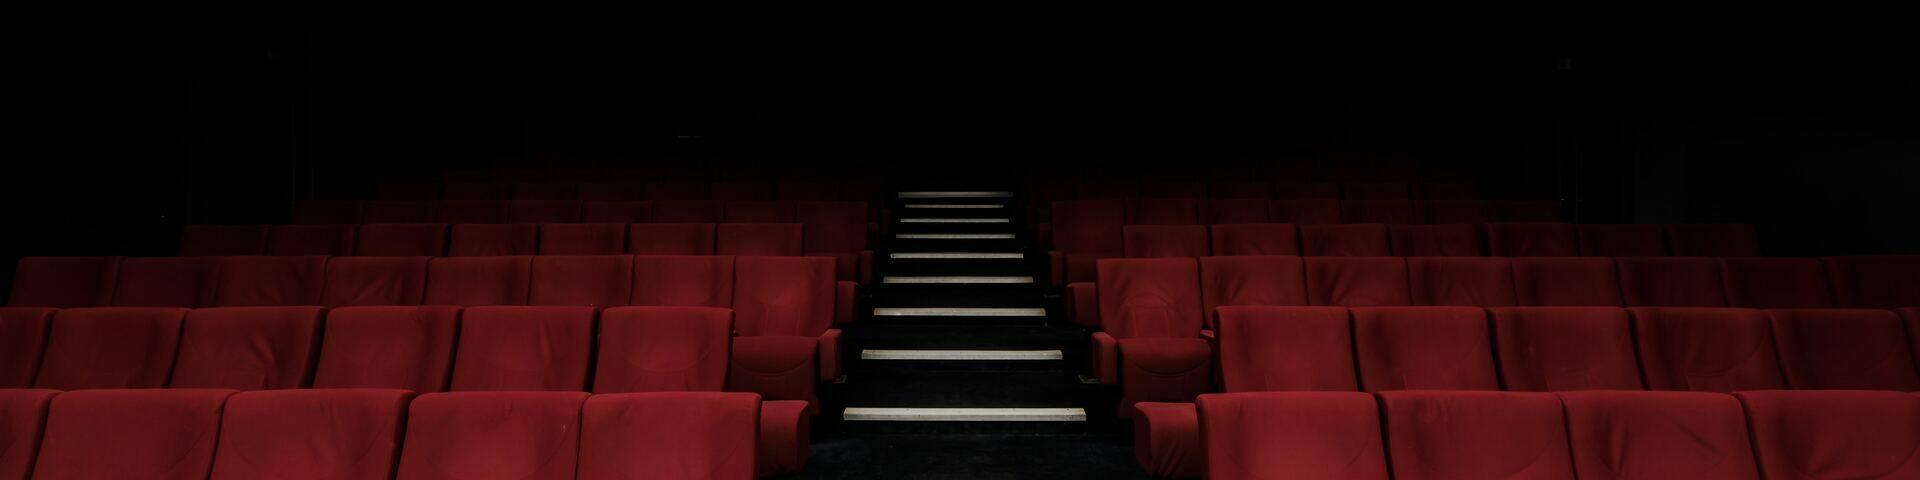 Cinéma © Felix Mooneeram